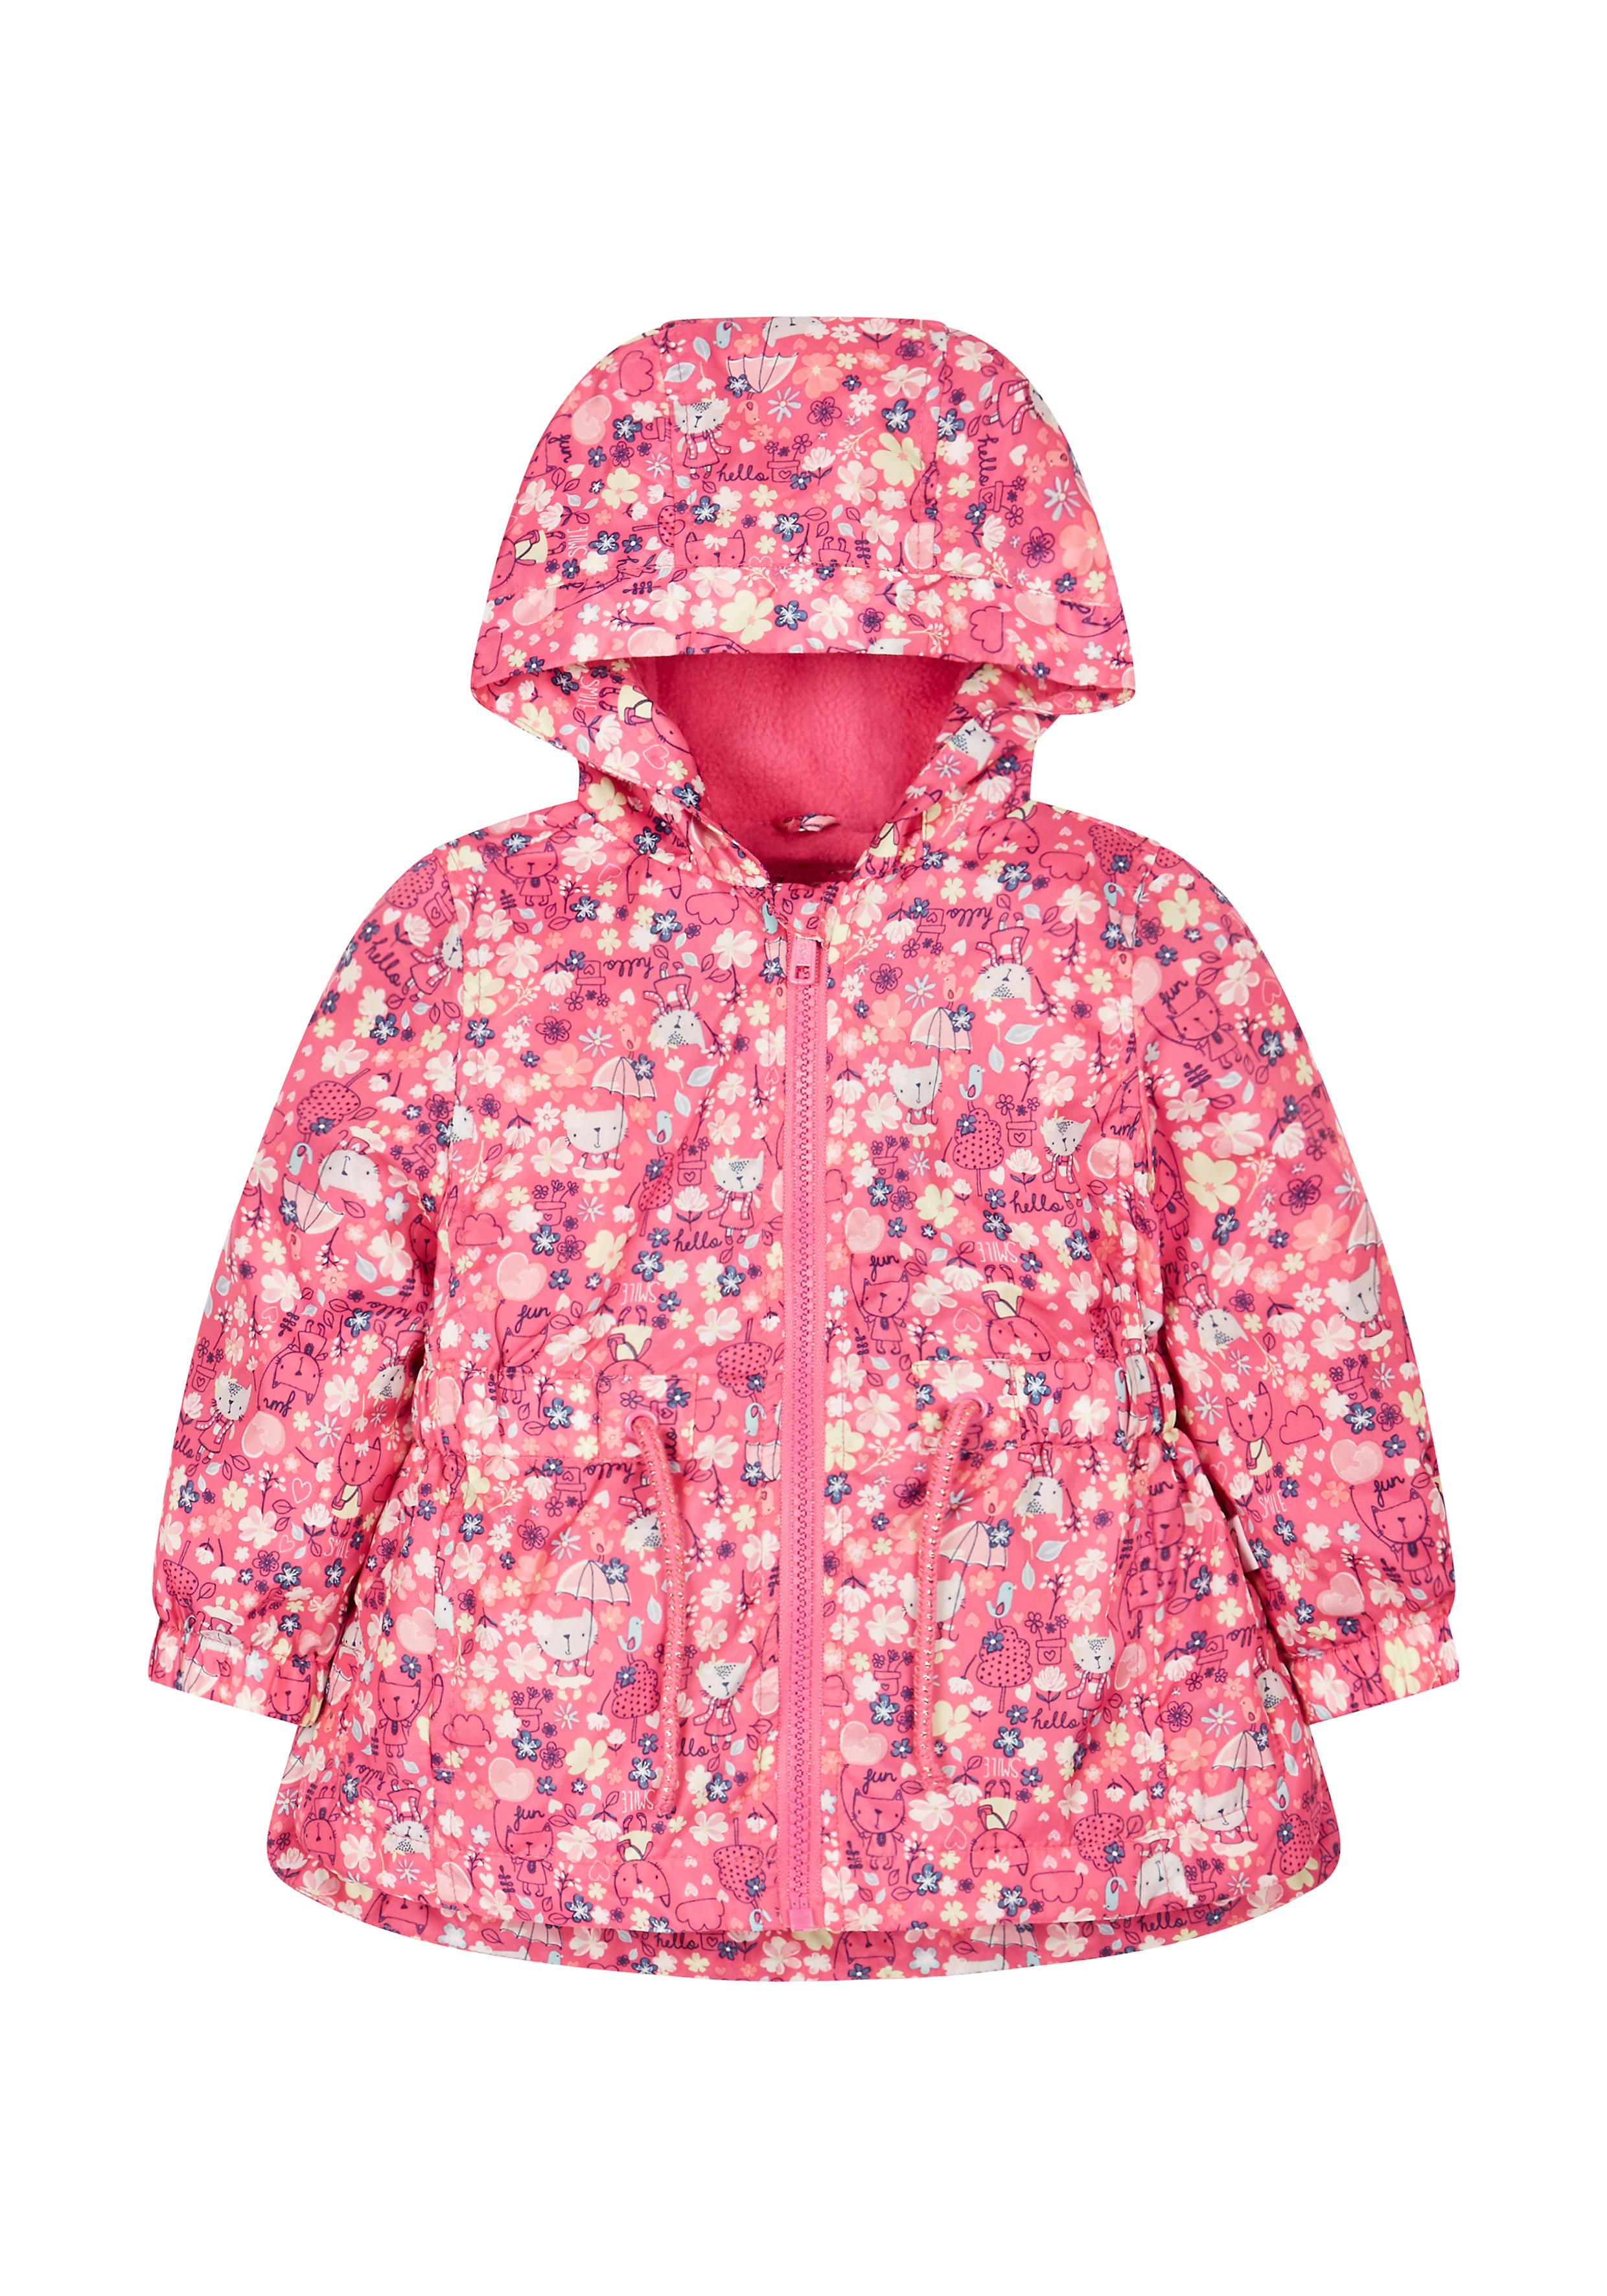 Mothercare | Girls Full Sleeves Jacket Cat Print - Pink